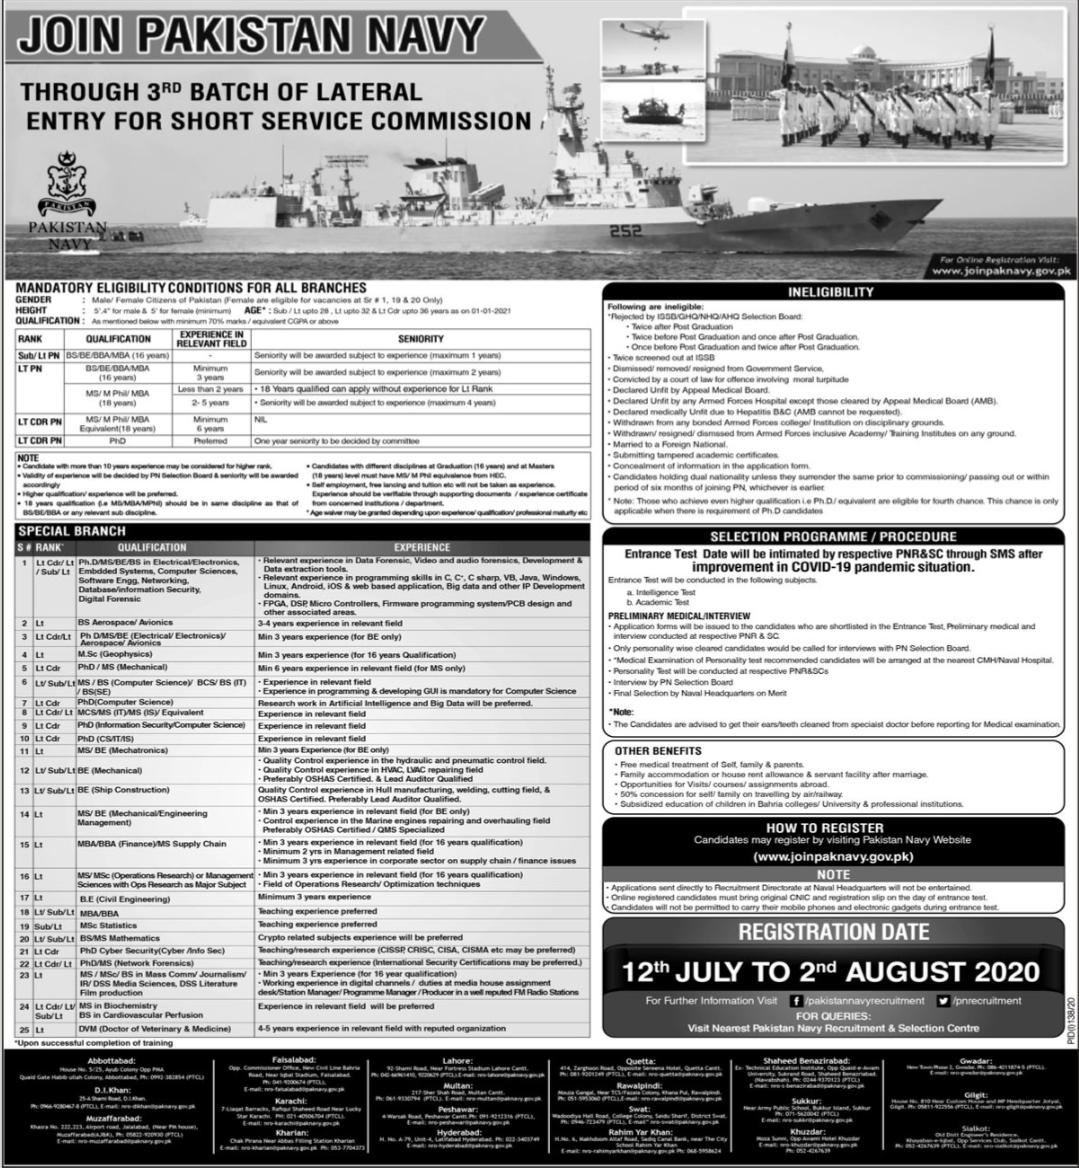 Join Pakistan Navy Through 3rd Batch